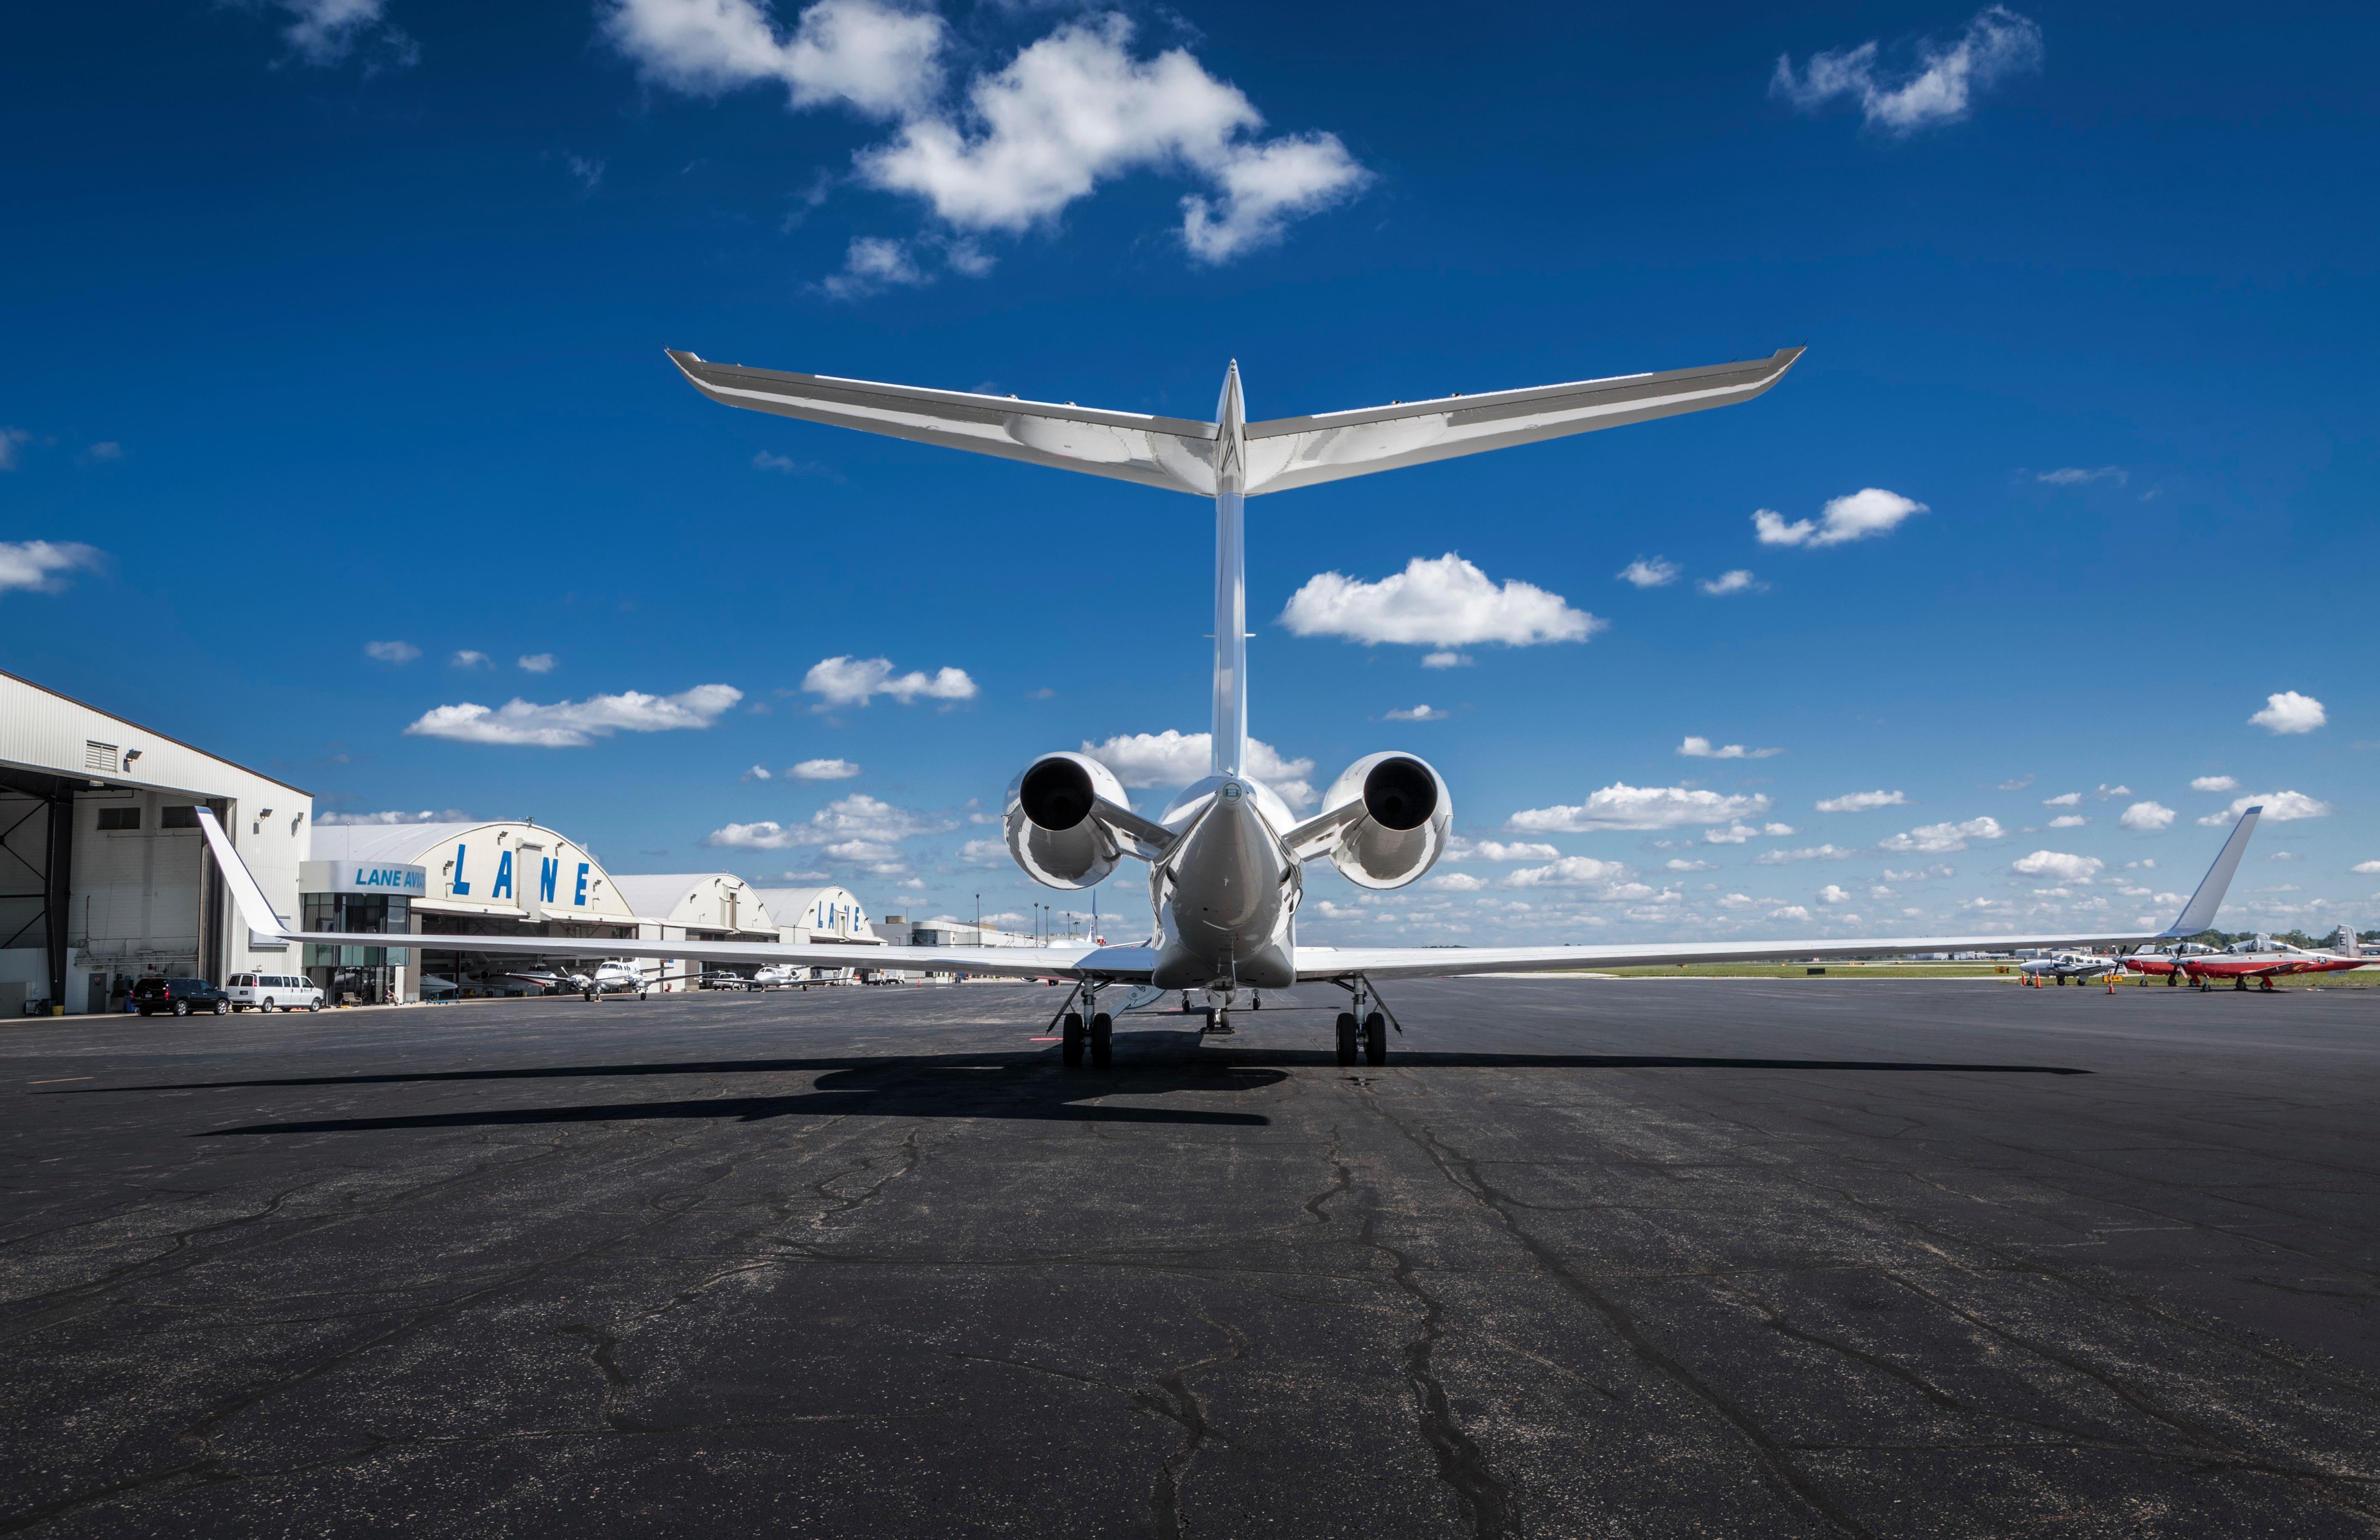 Lane Aviation image 2